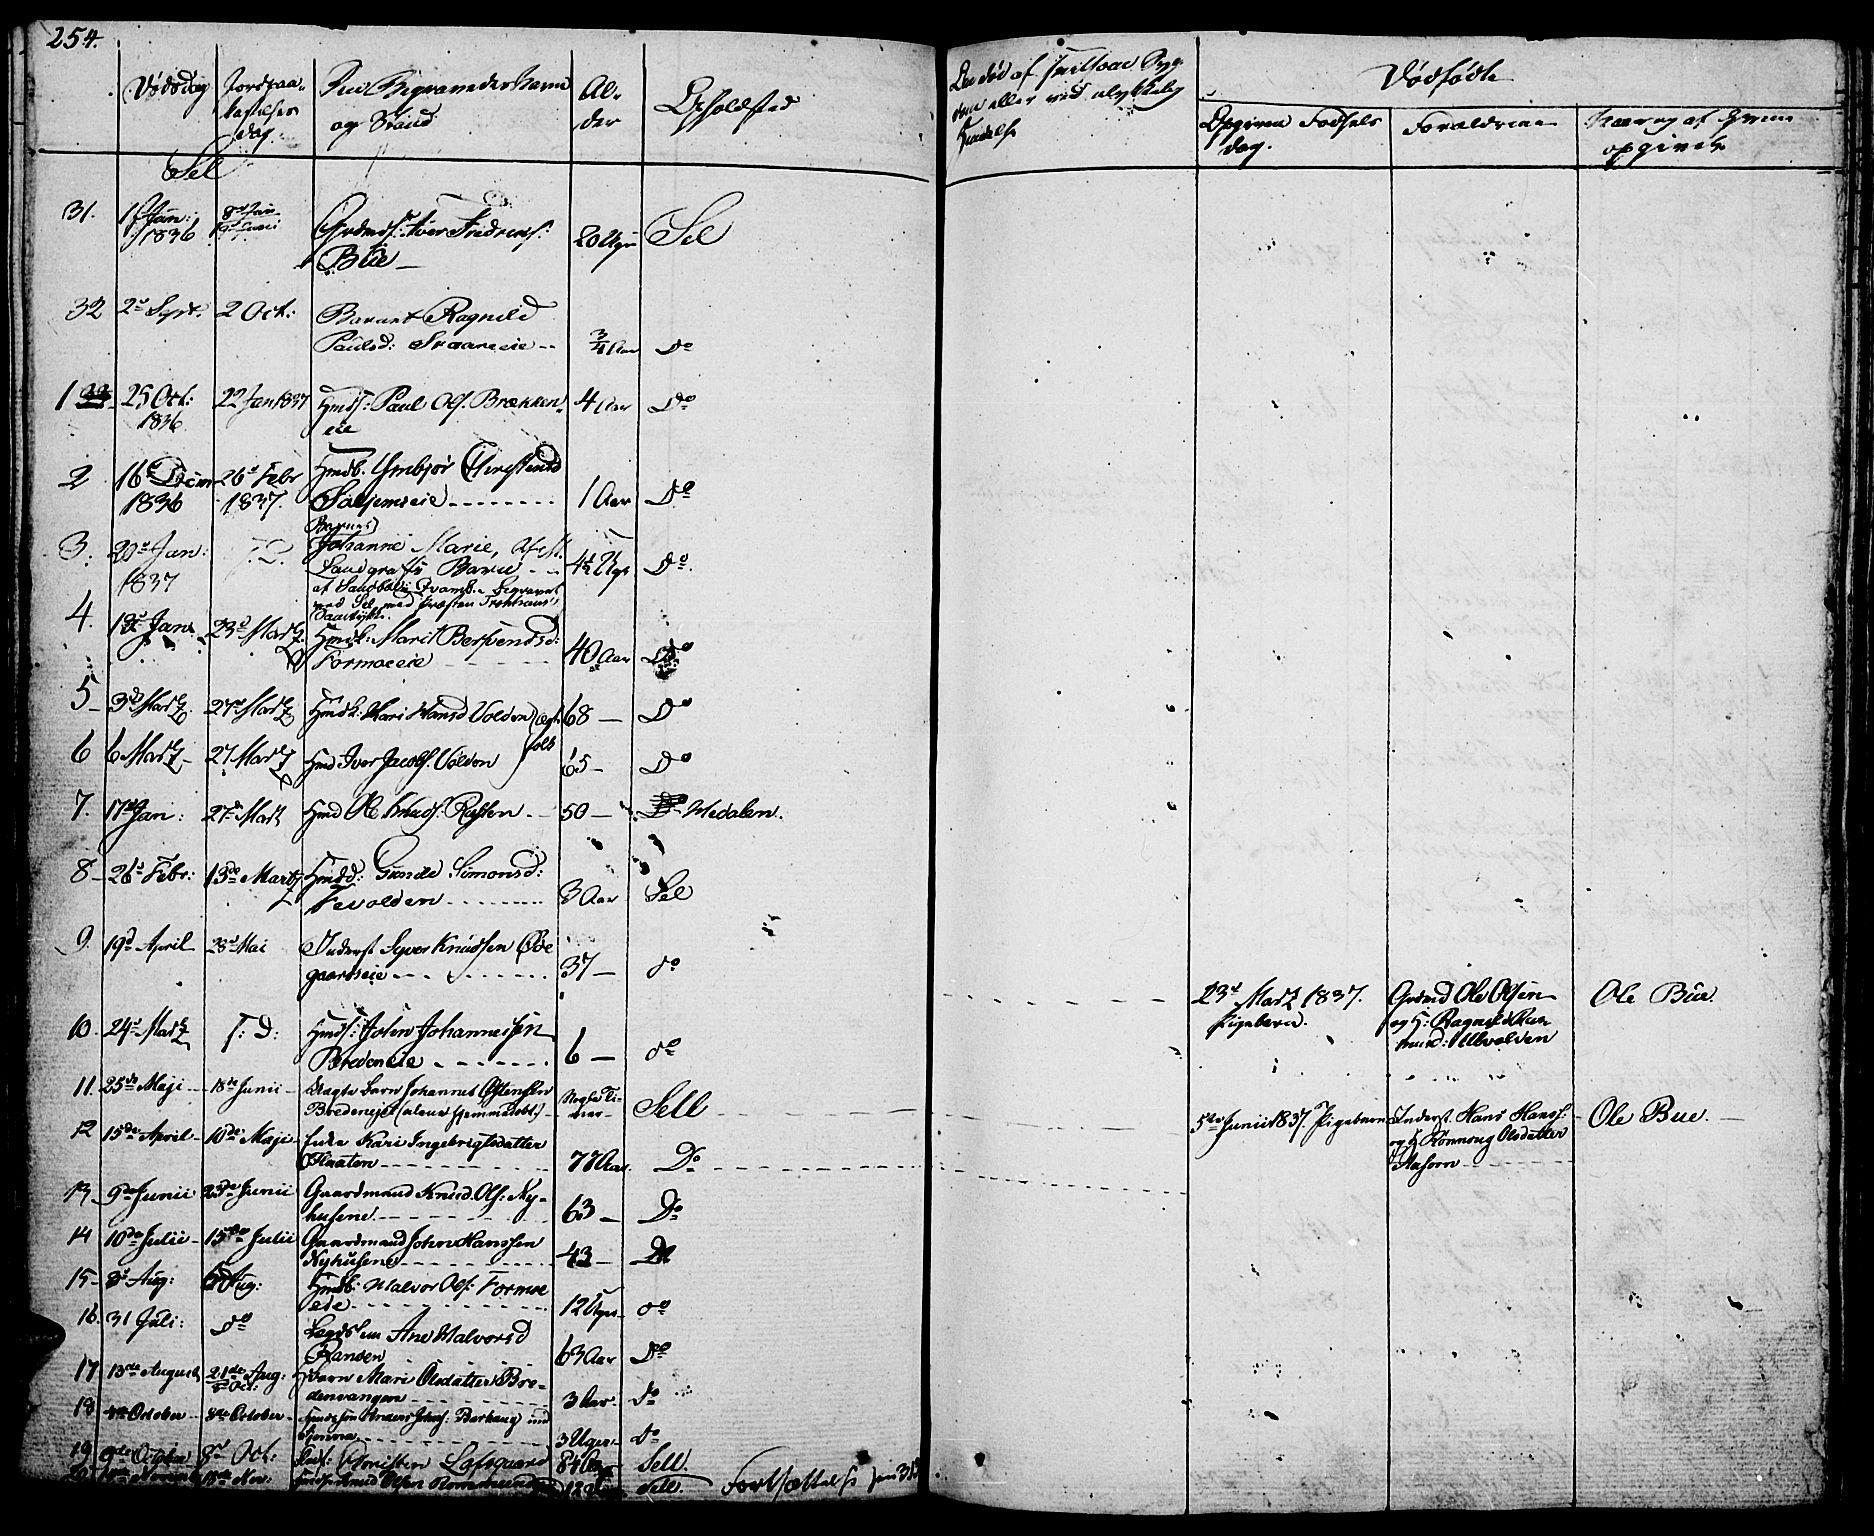 SAH, Vågå prestekontor, Ministerialbok nr. 4 /3, 1834-1842, s. 254